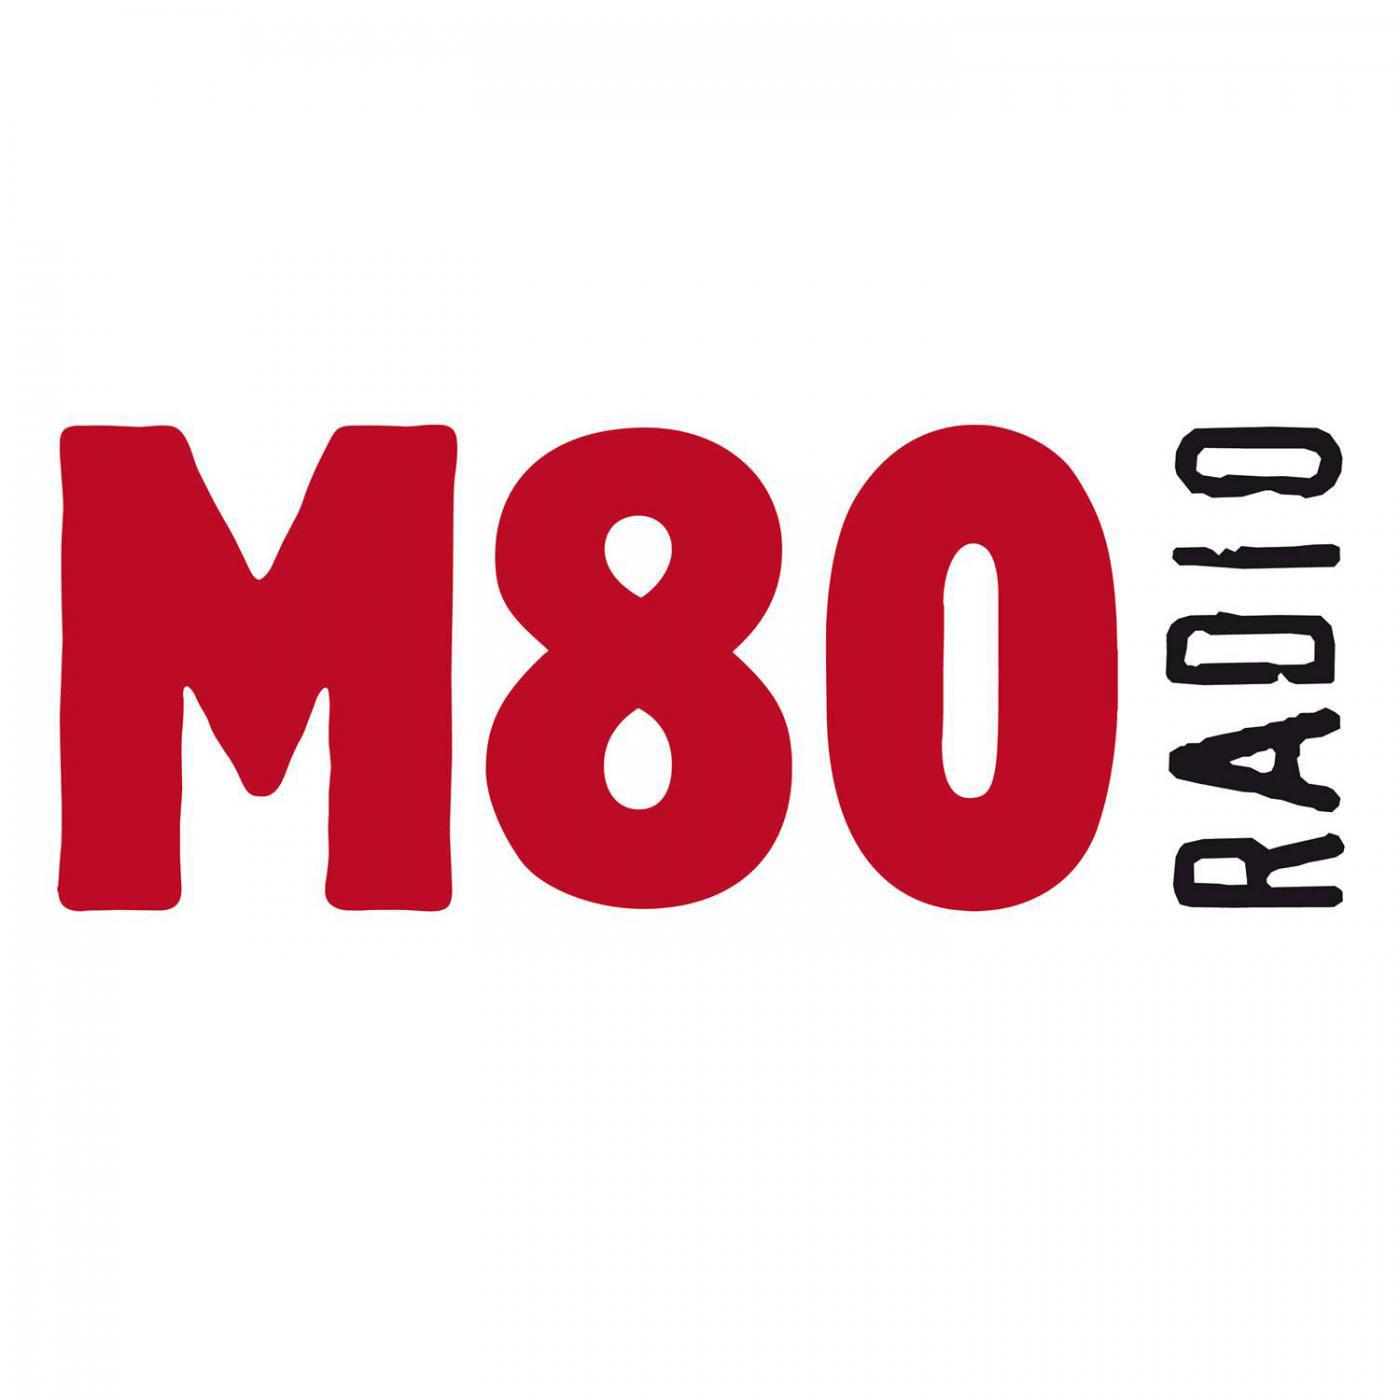 escuchar m80 en directo online dating